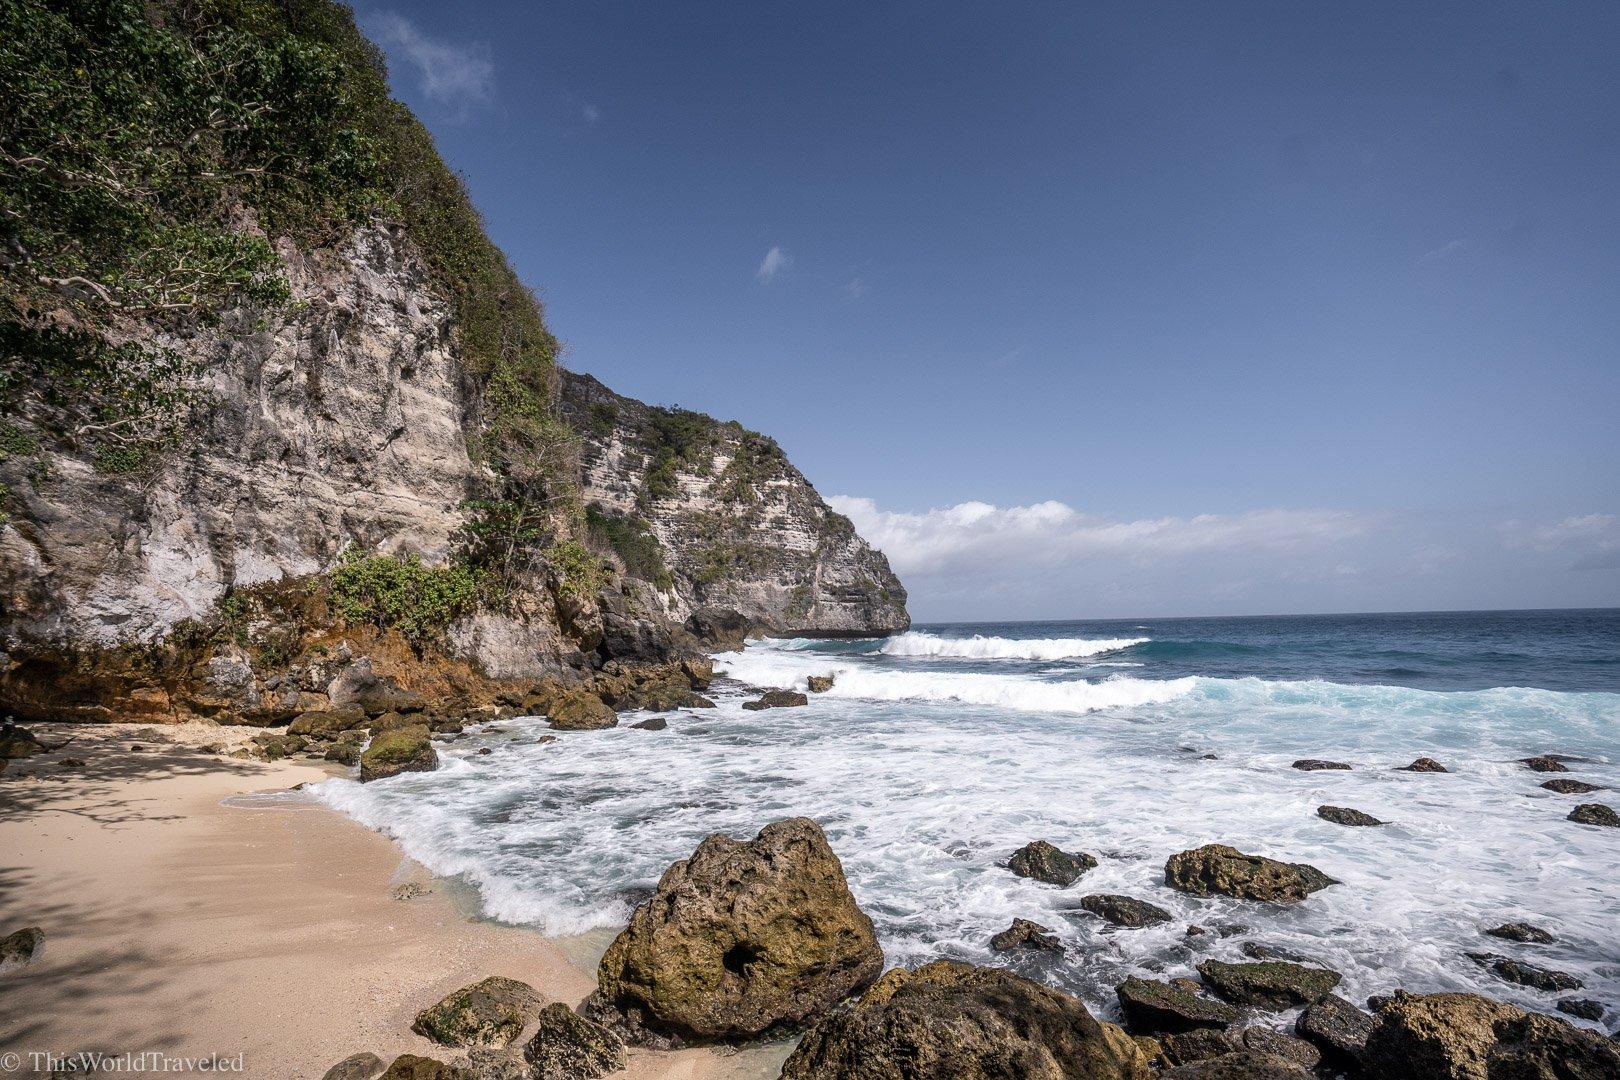 Sandy beach with limestone cliffs on Nusa Penida, Bali